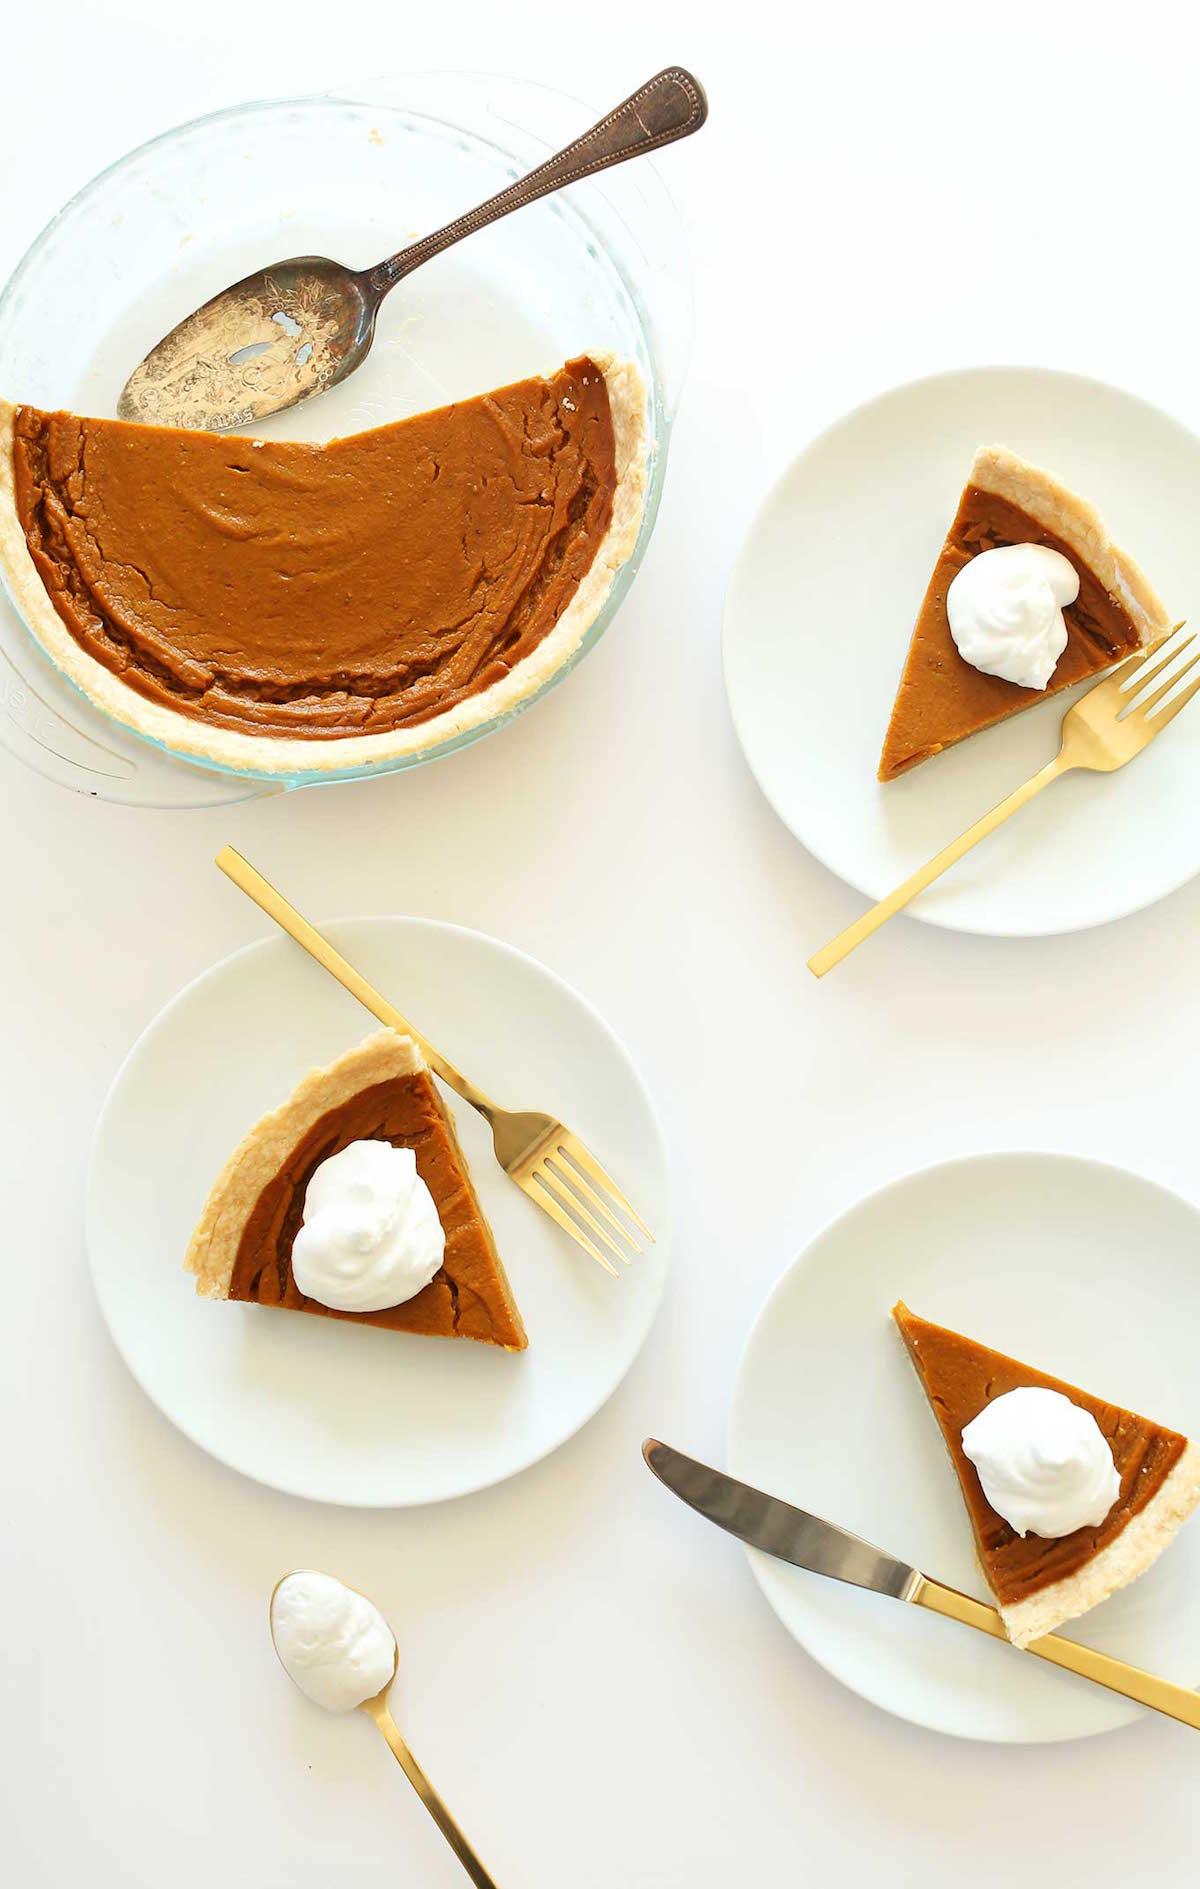 Vegan Pumpkin Pie served onto white plates